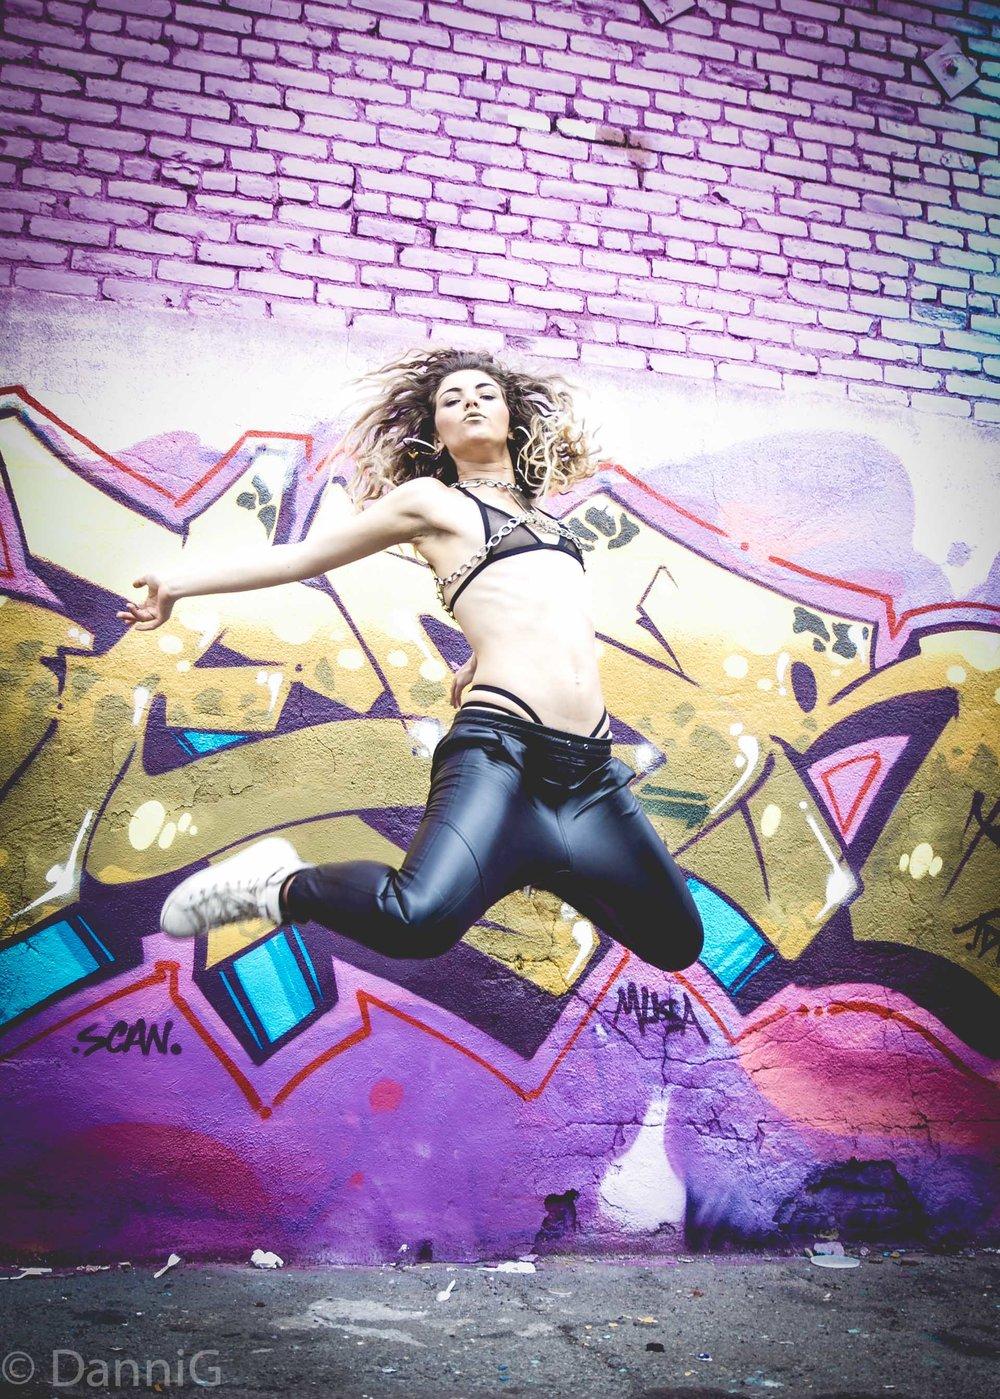 alea+dance+jump-0092.jpg